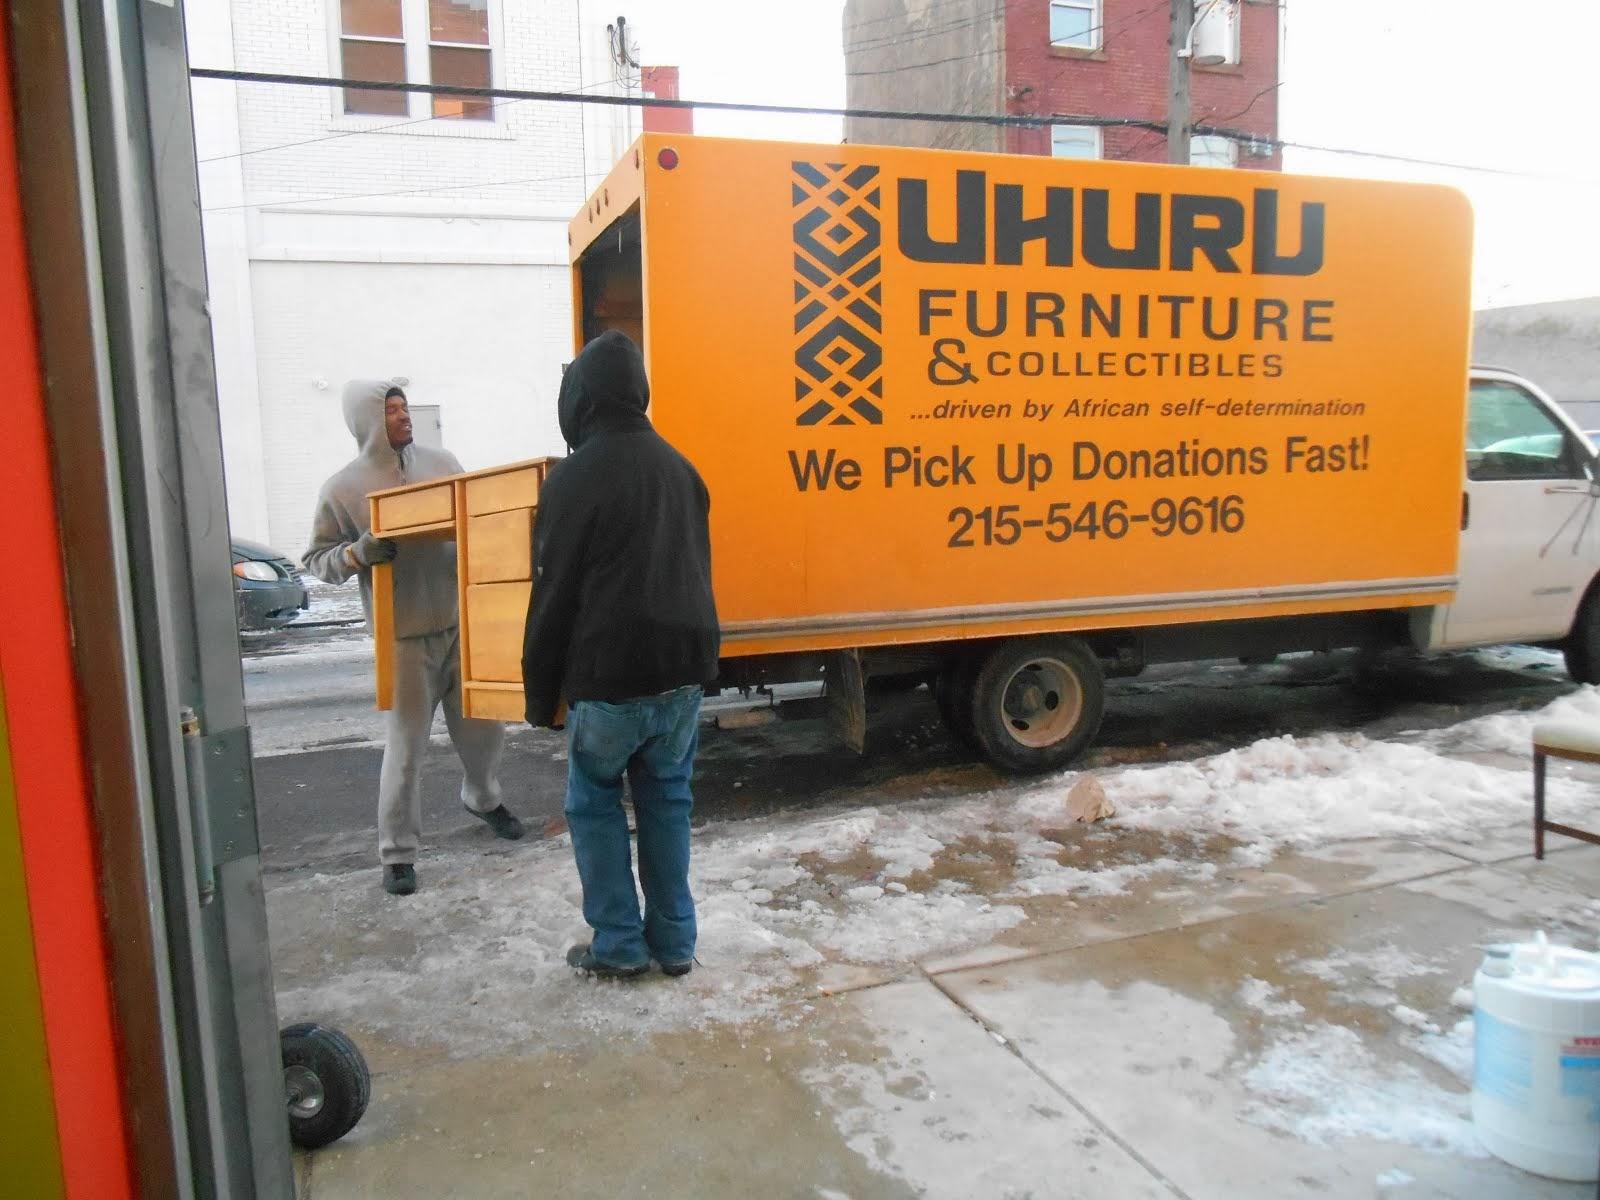 Uhuru Furniture  Collectibles Donate